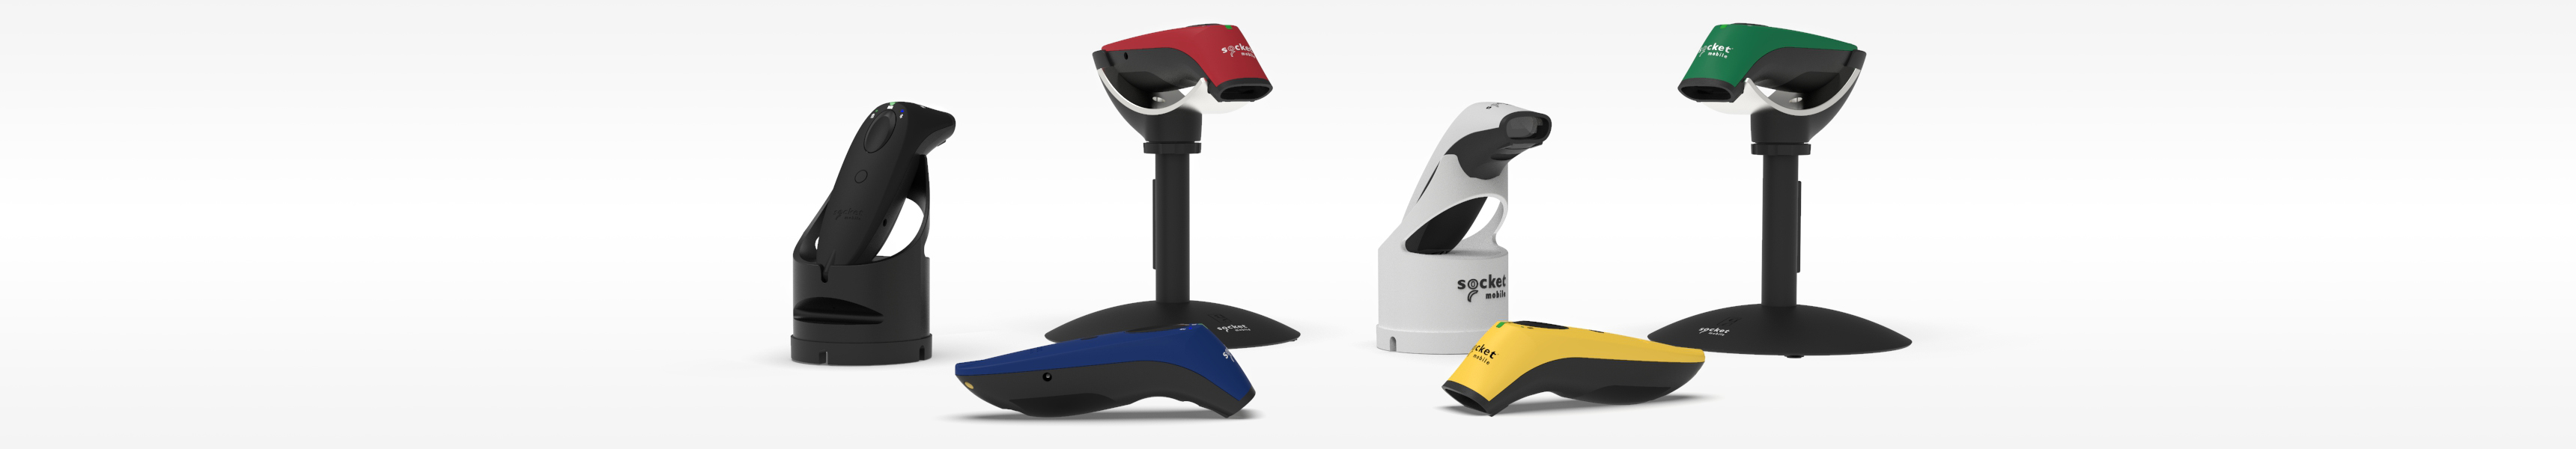 socketscan-700series-usecase